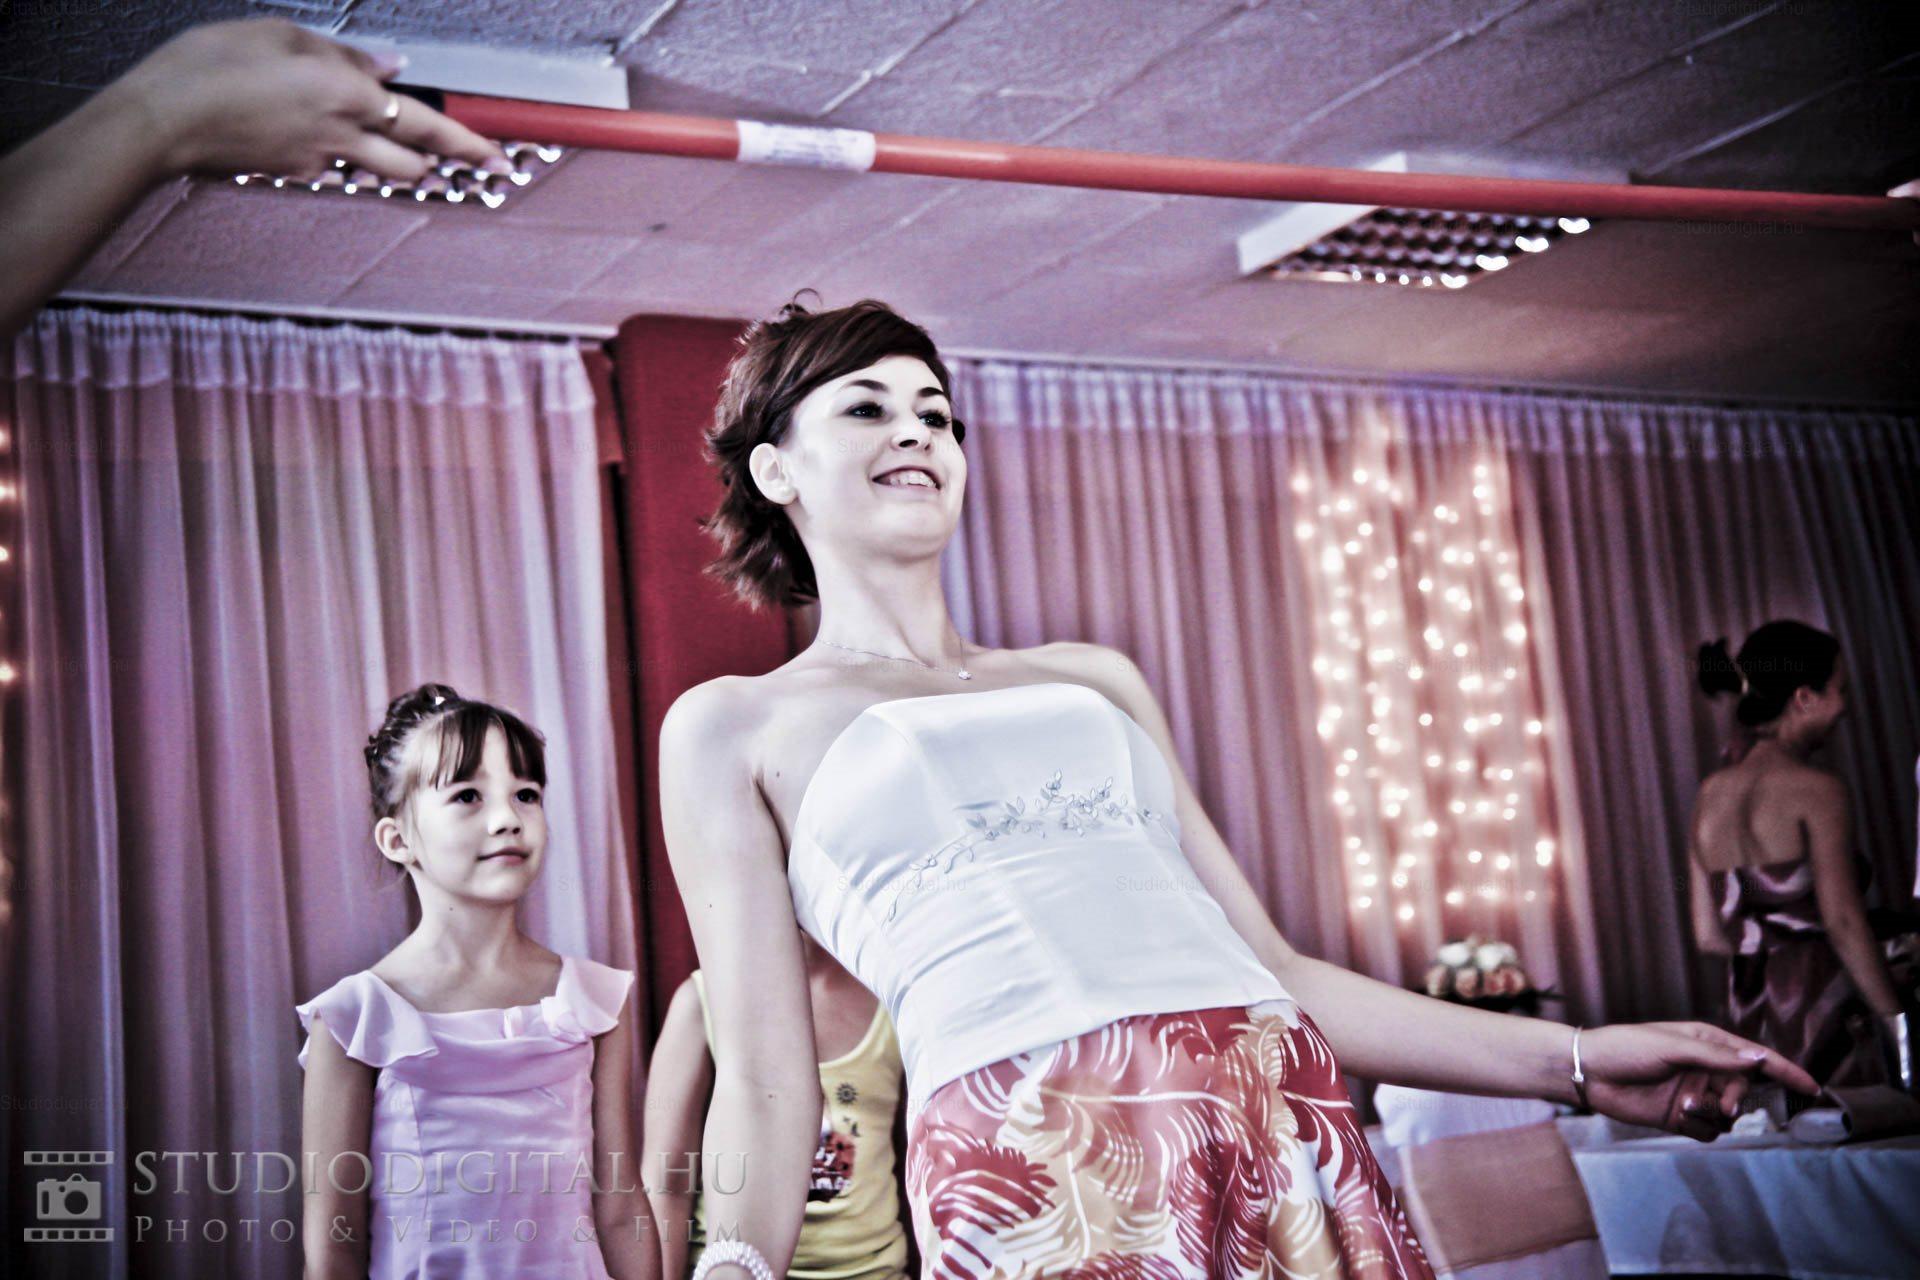 StudioDigital.hu290